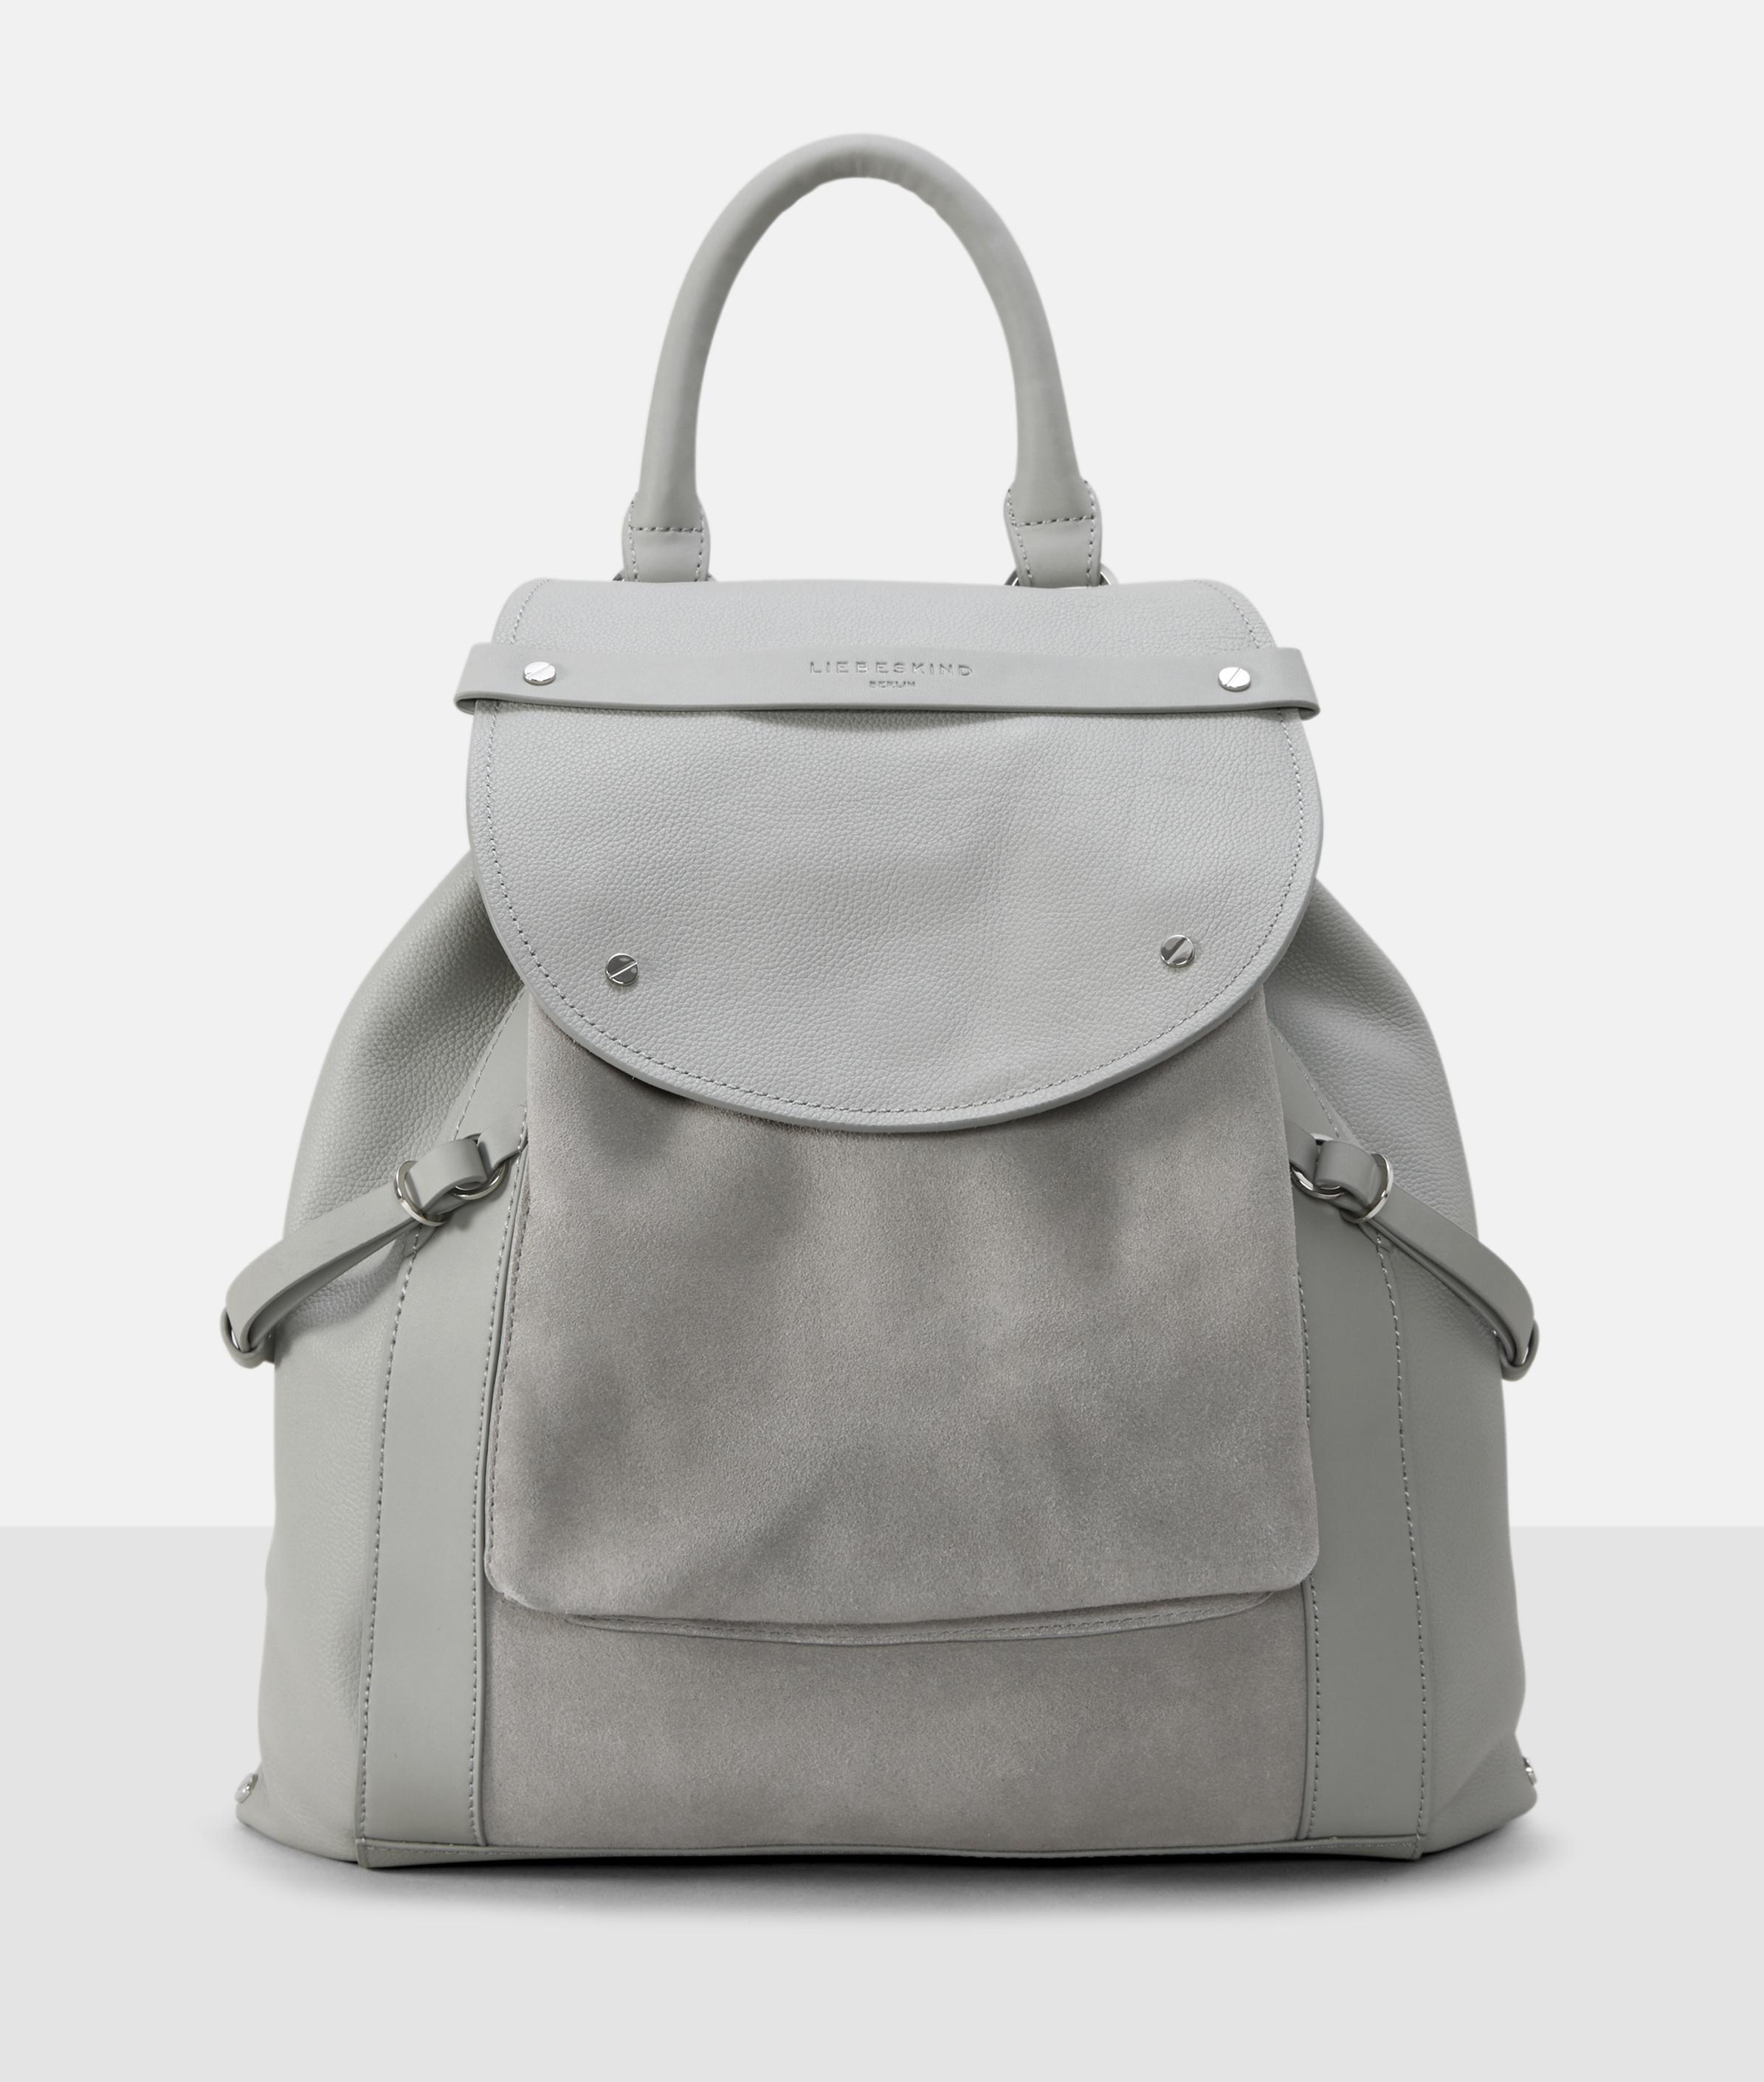 Berlin Tasche New Saddle Backpack M, Grau/Schwarz